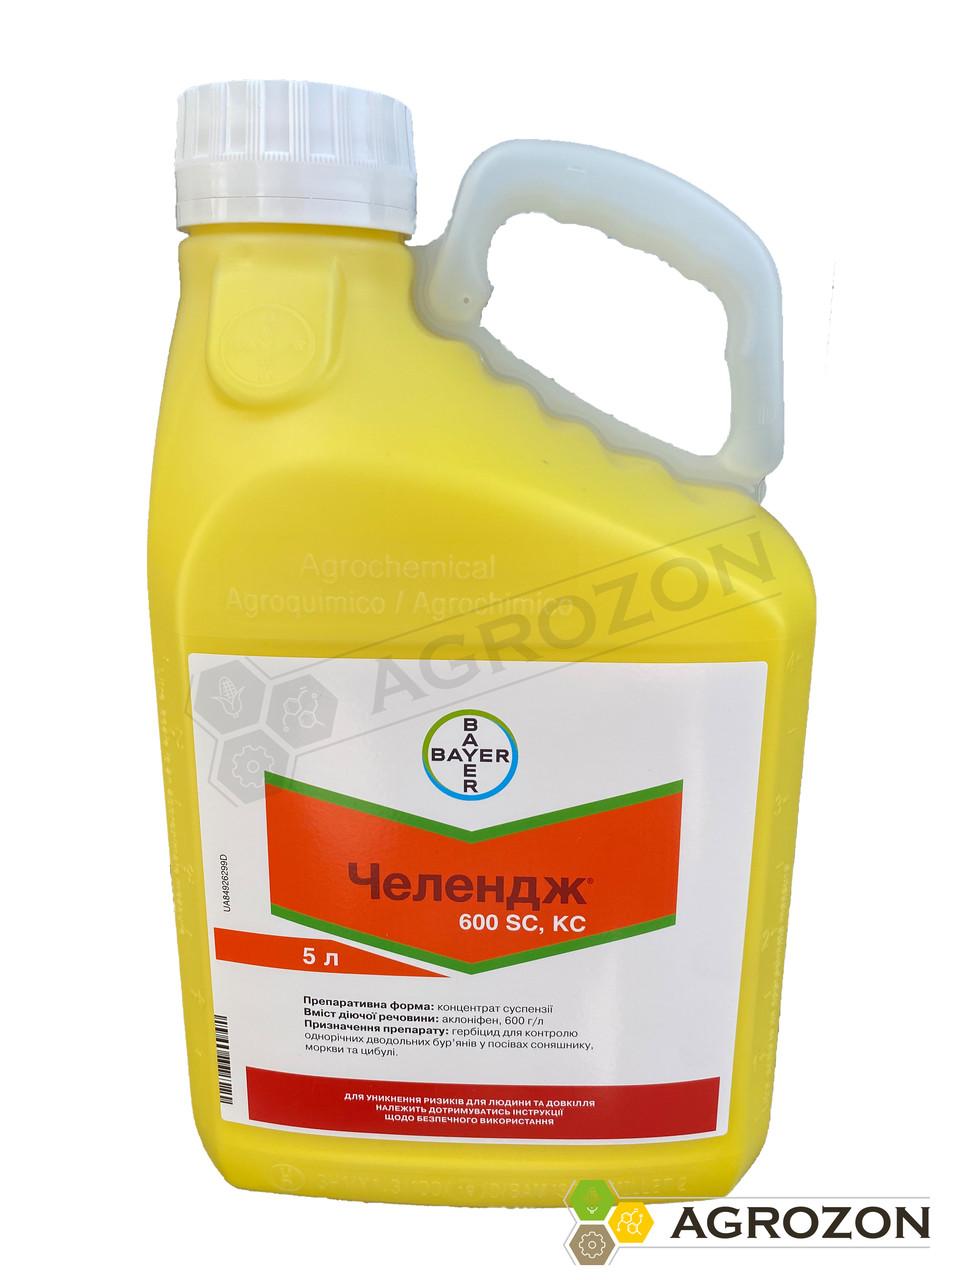 Гербицид Челендж Bayer -  5 л